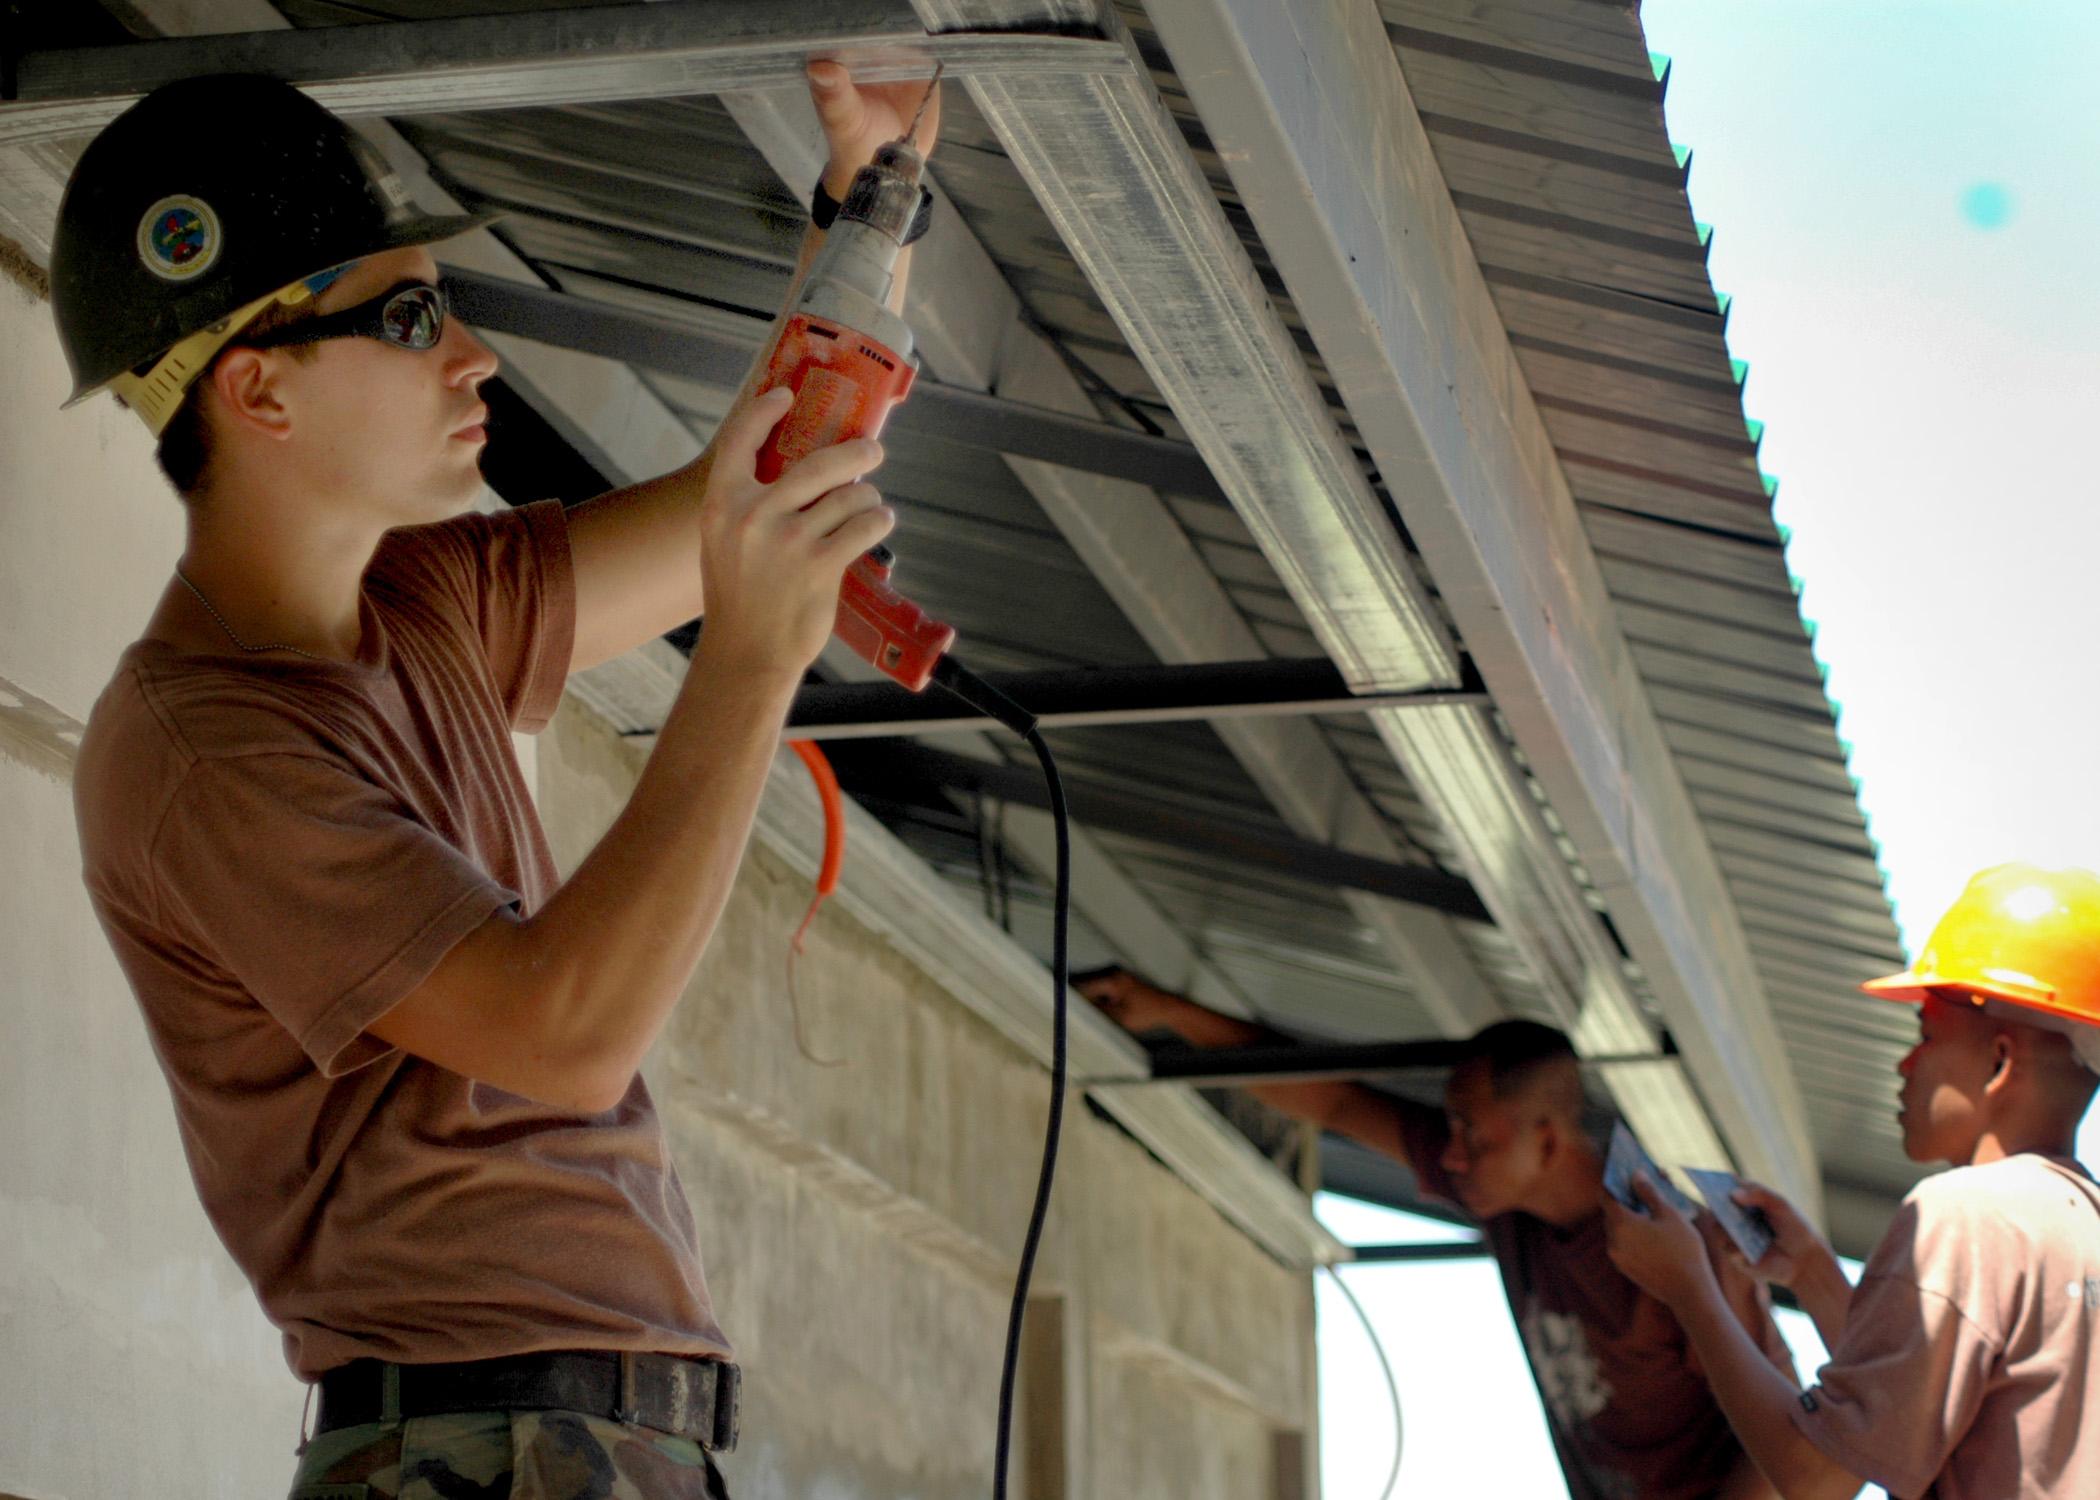 File:US Navy 060809-N-0553R-004 Builder Constructionman ...